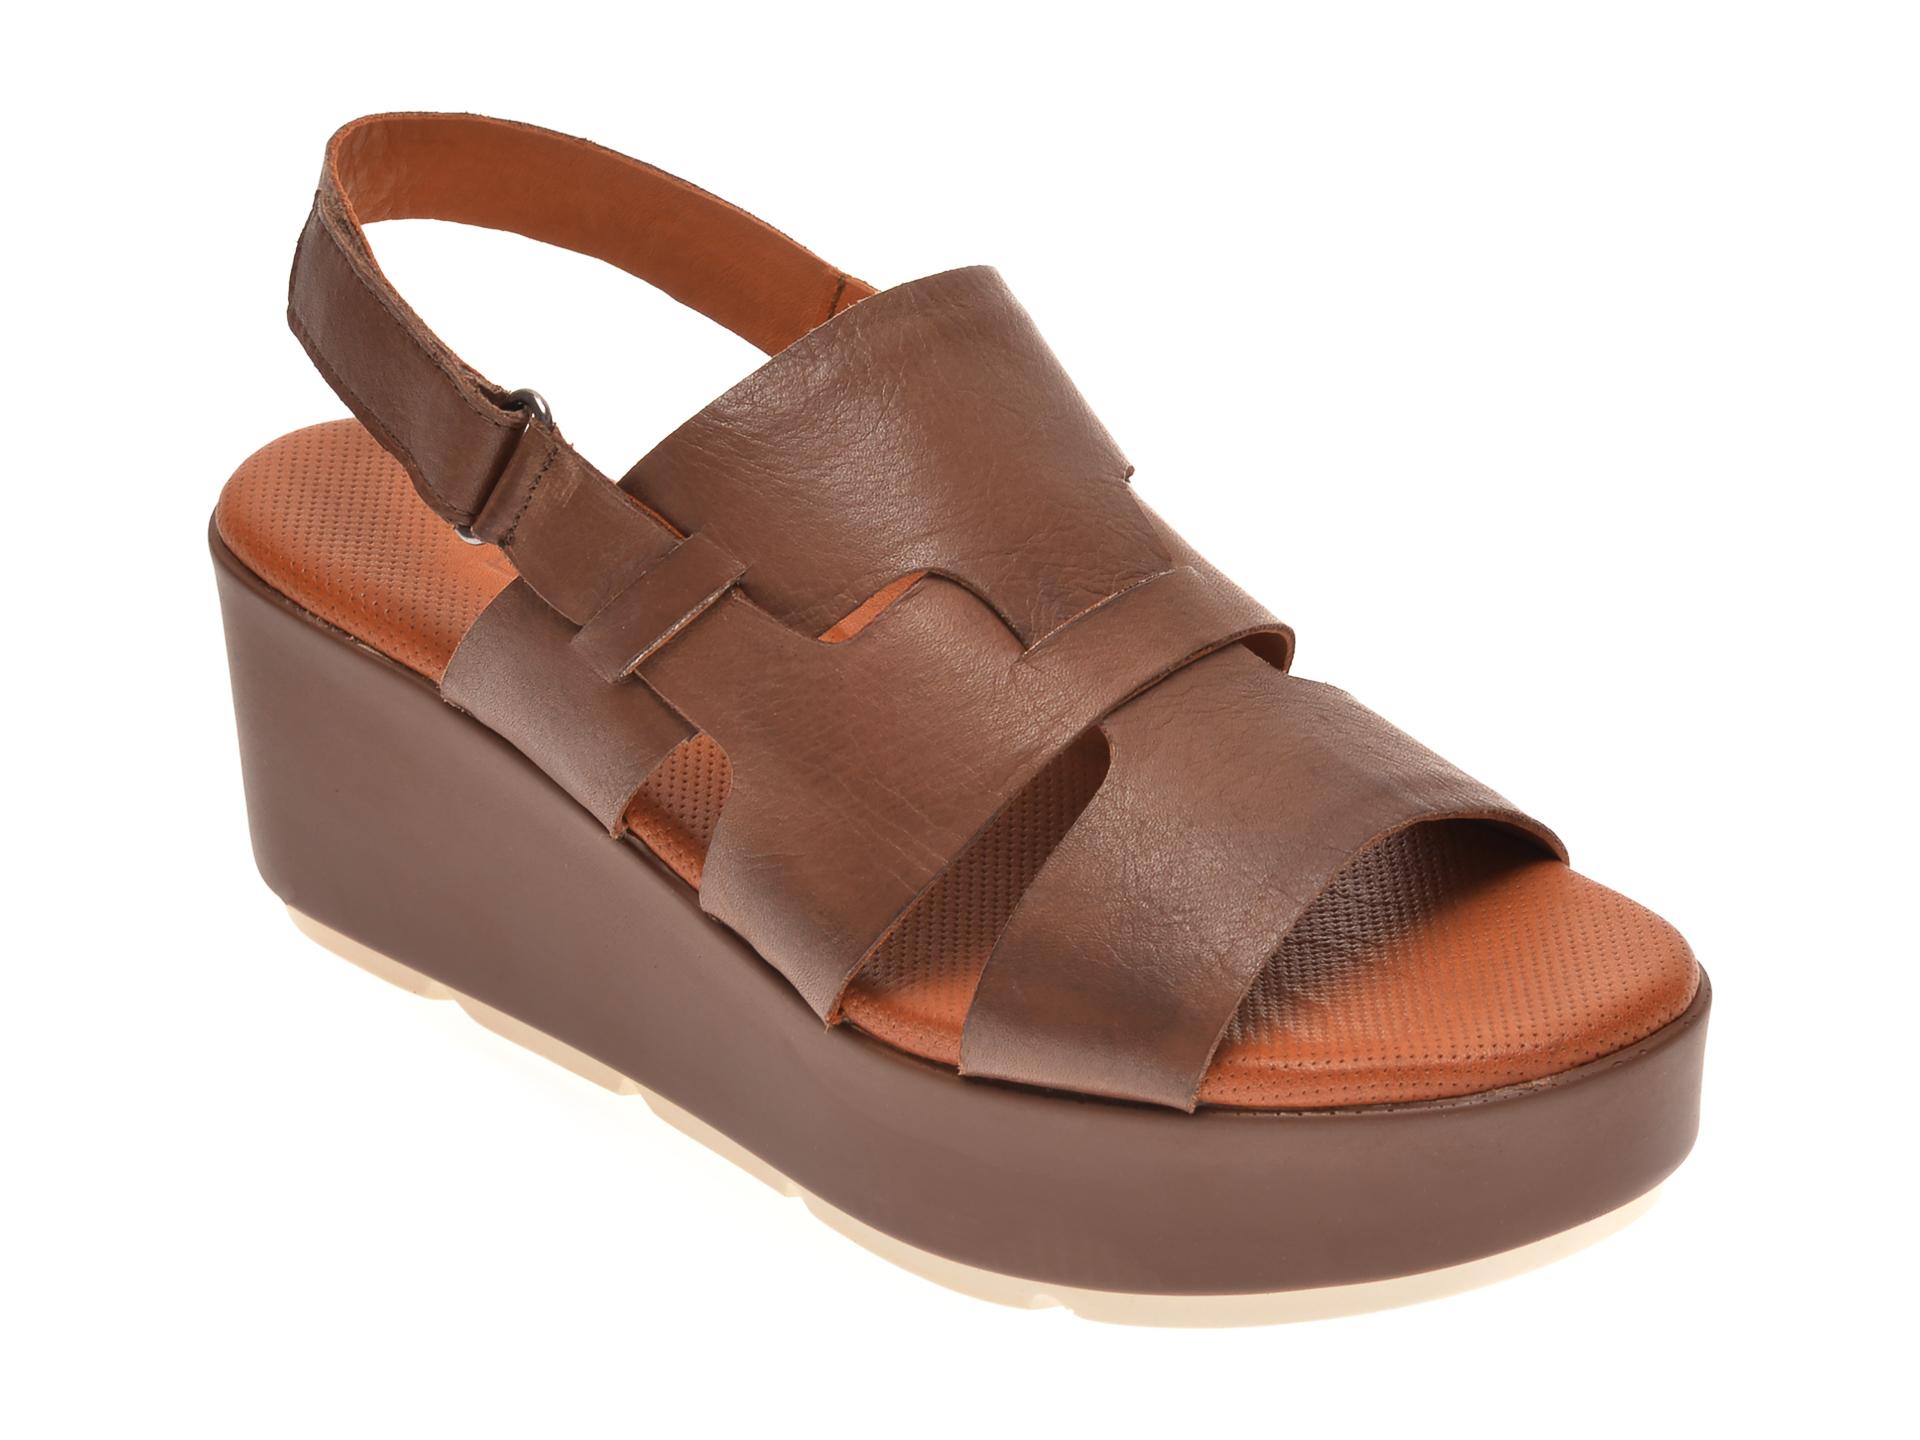 Sandale BABOOS maro, 2519, din piele naturala